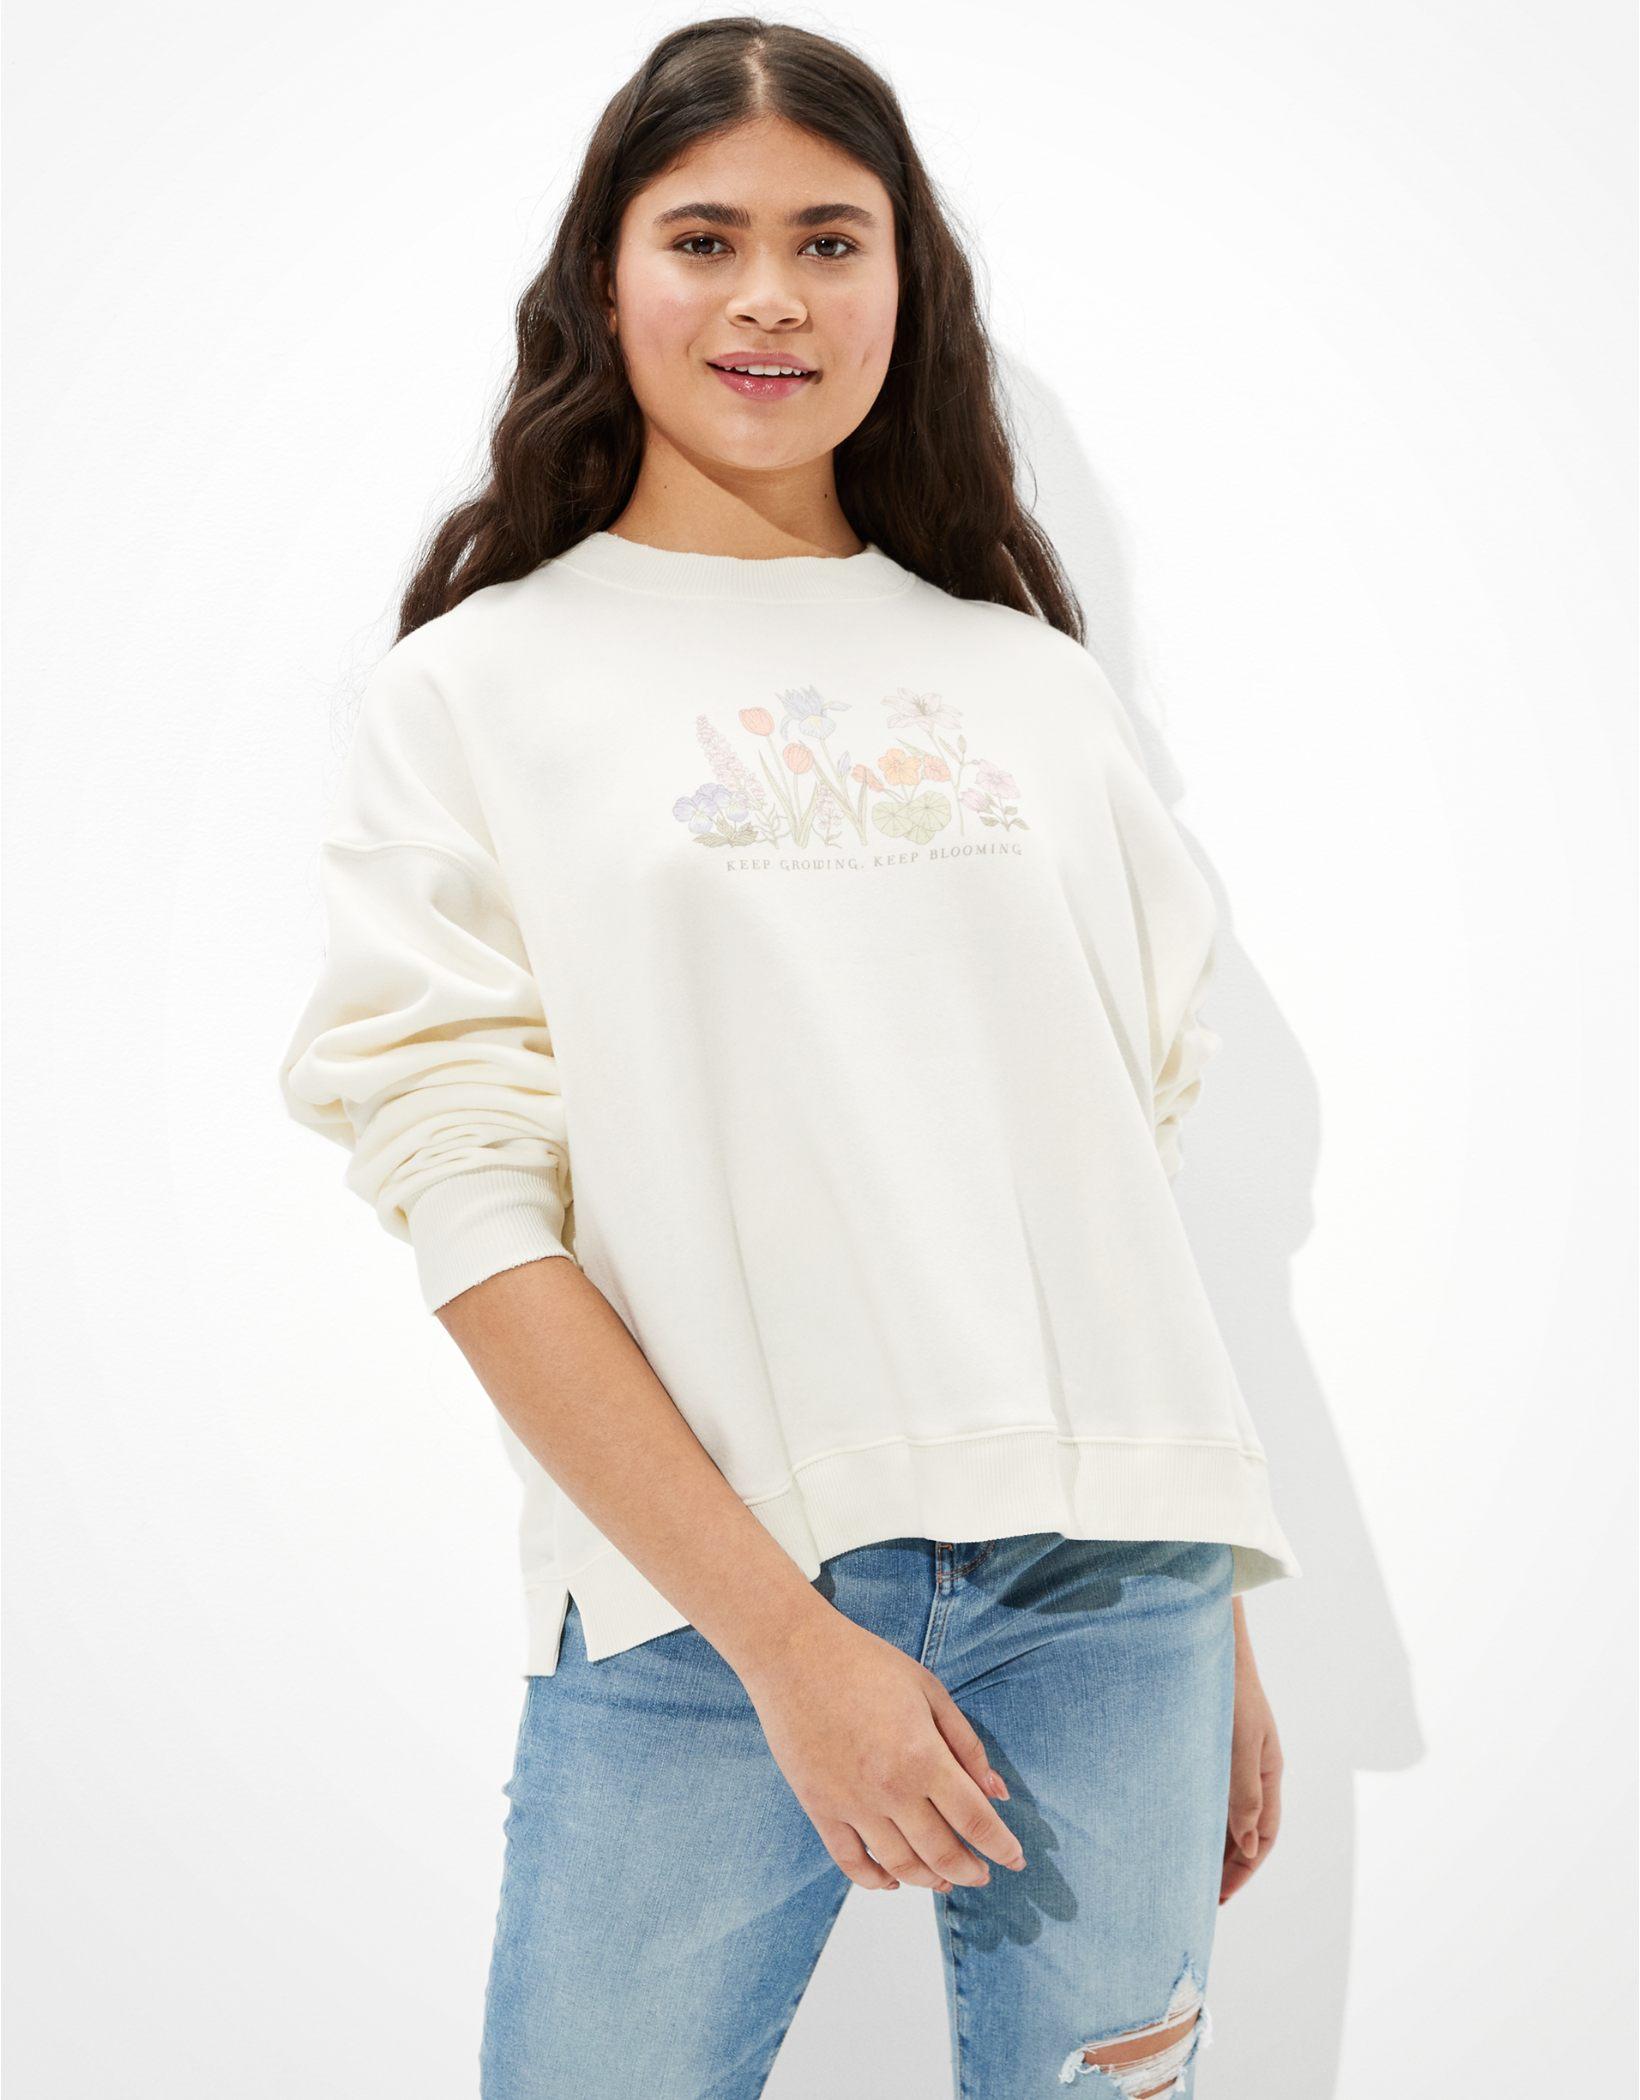 AE Forever Graphic Crew Neck Sweatshirt